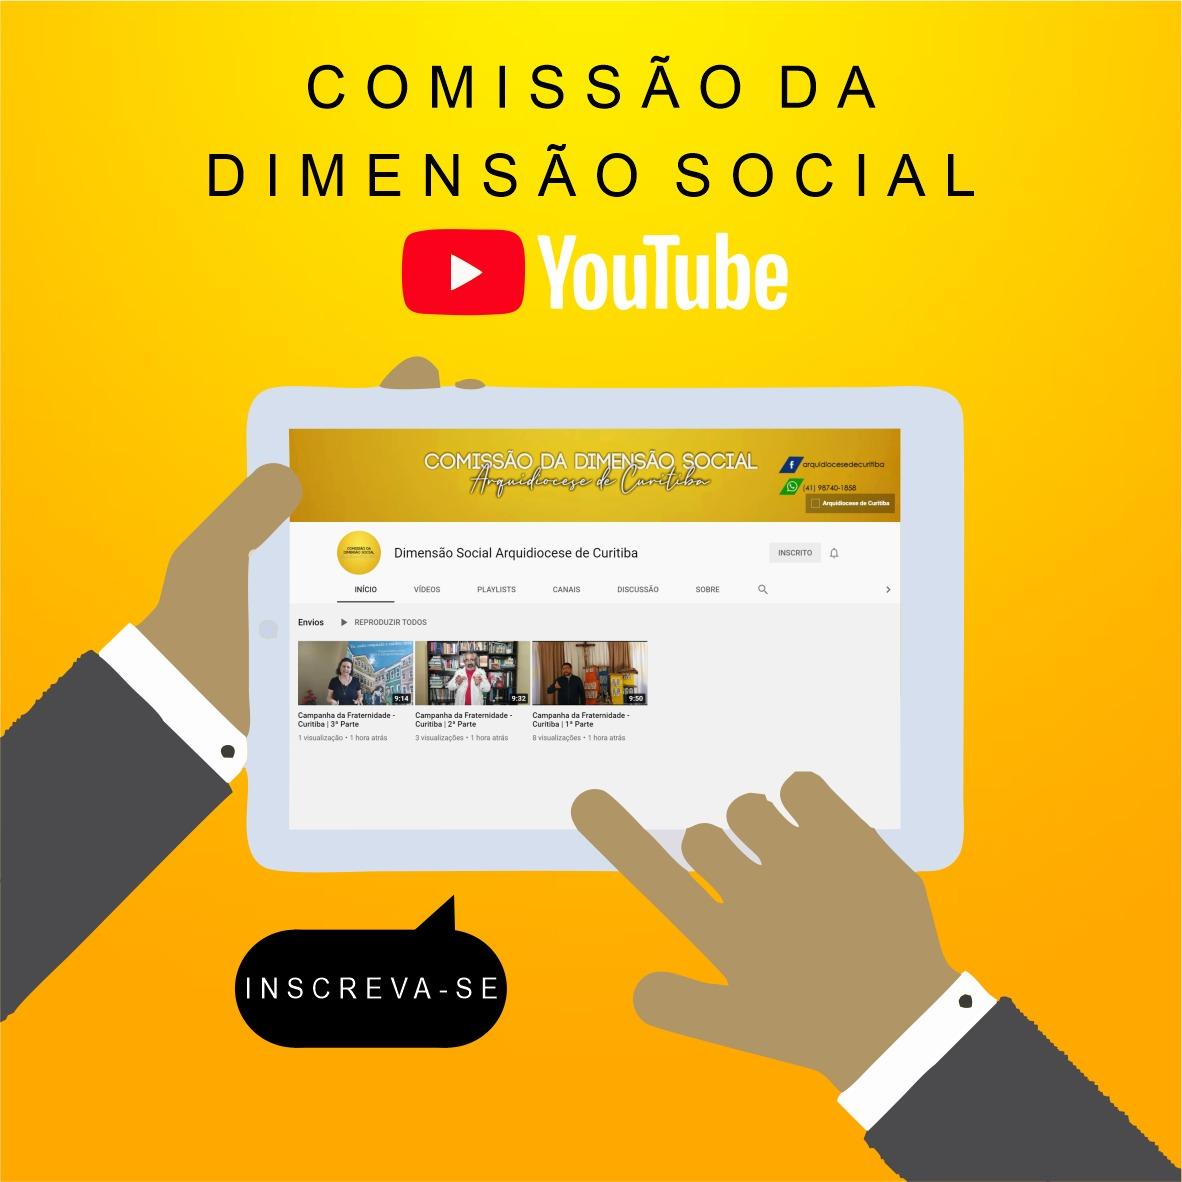 dimensao-social-no-youtube